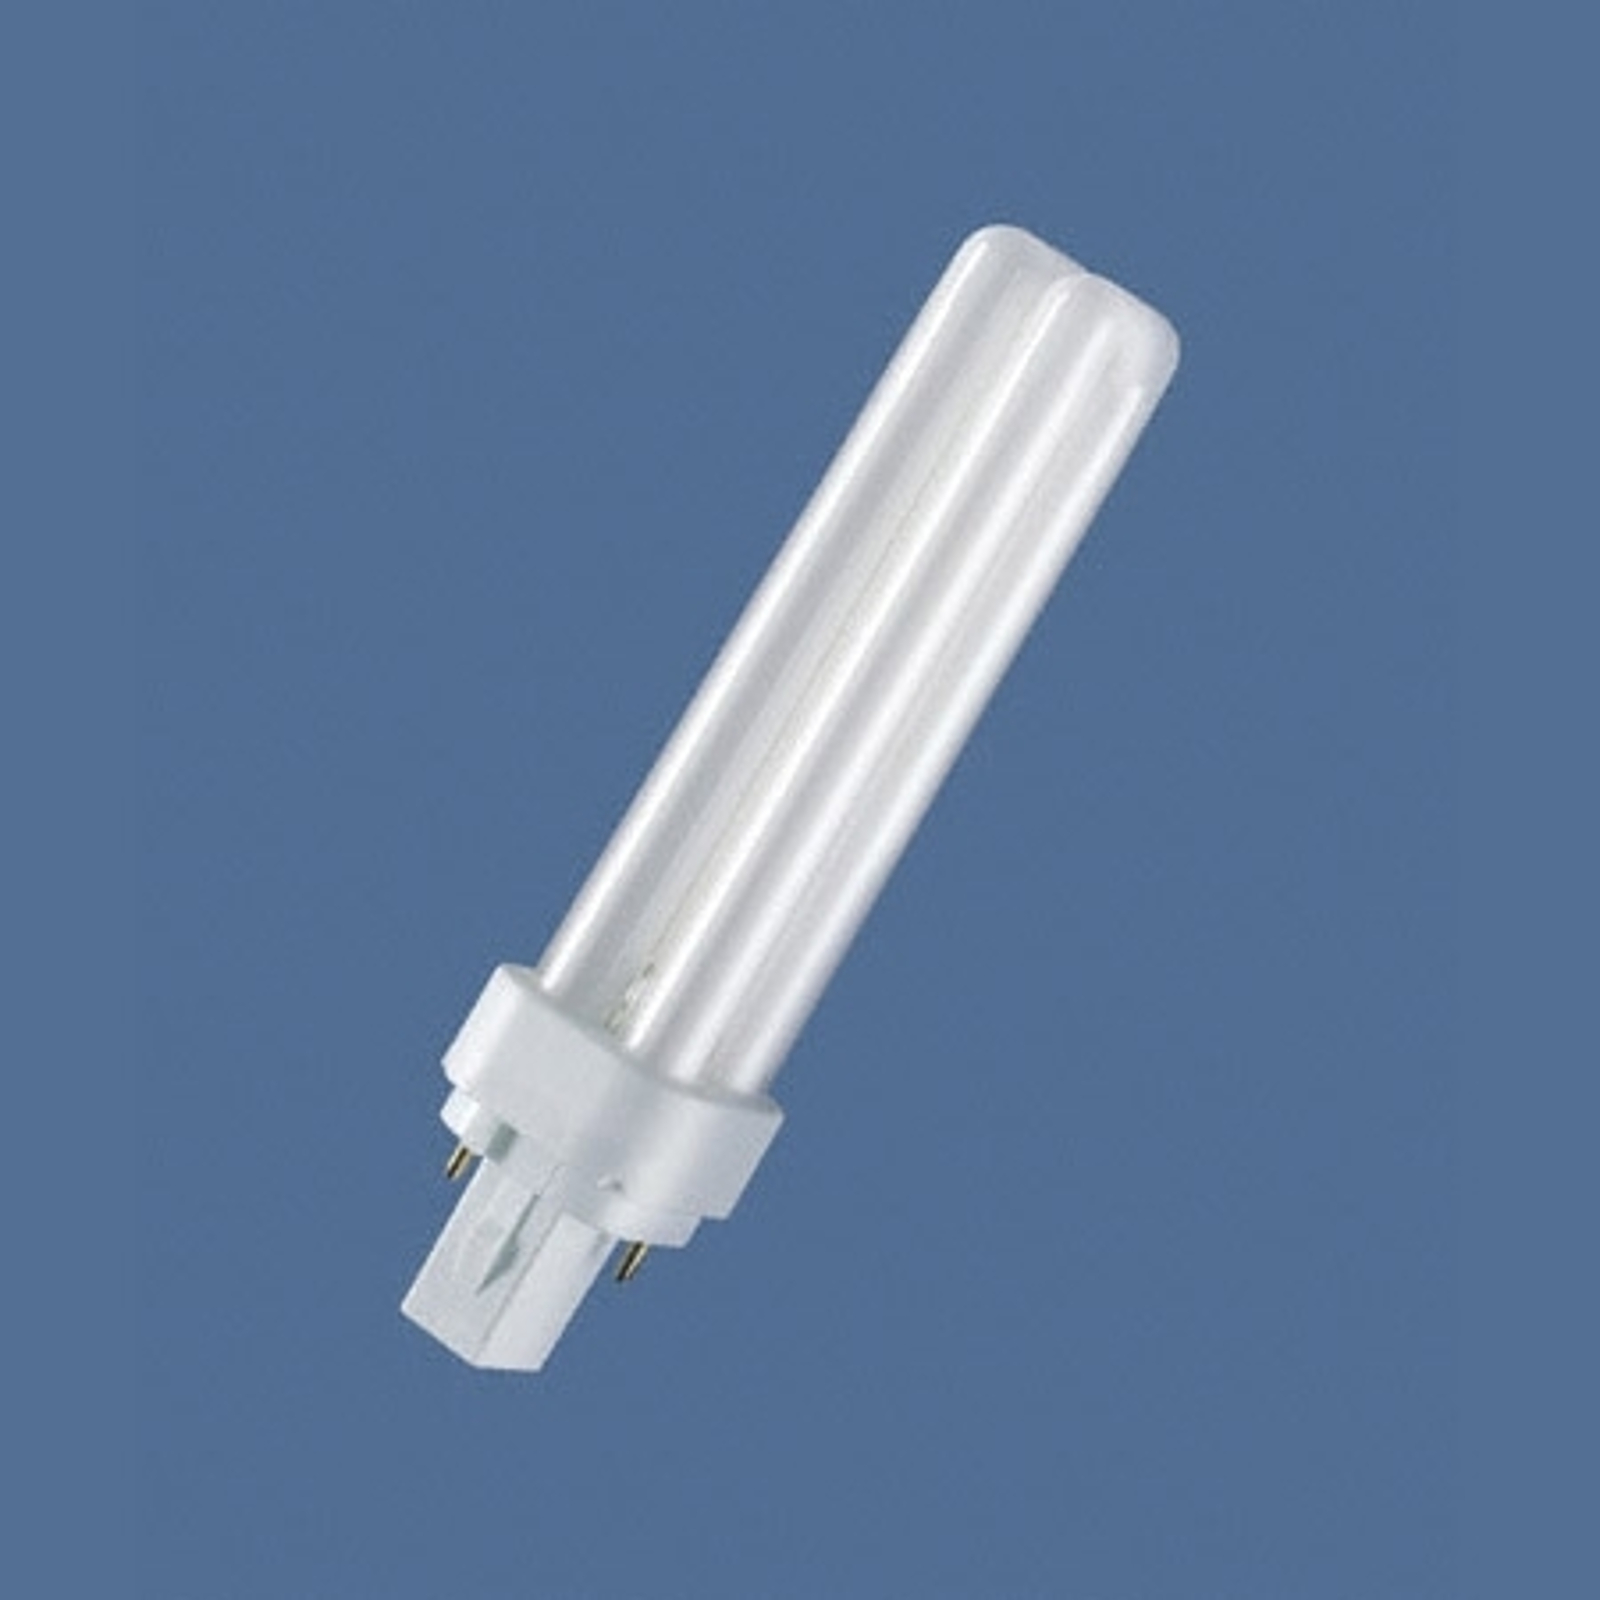 G24d 10W 827 Kompaktleuchtstofflampe Dulux D